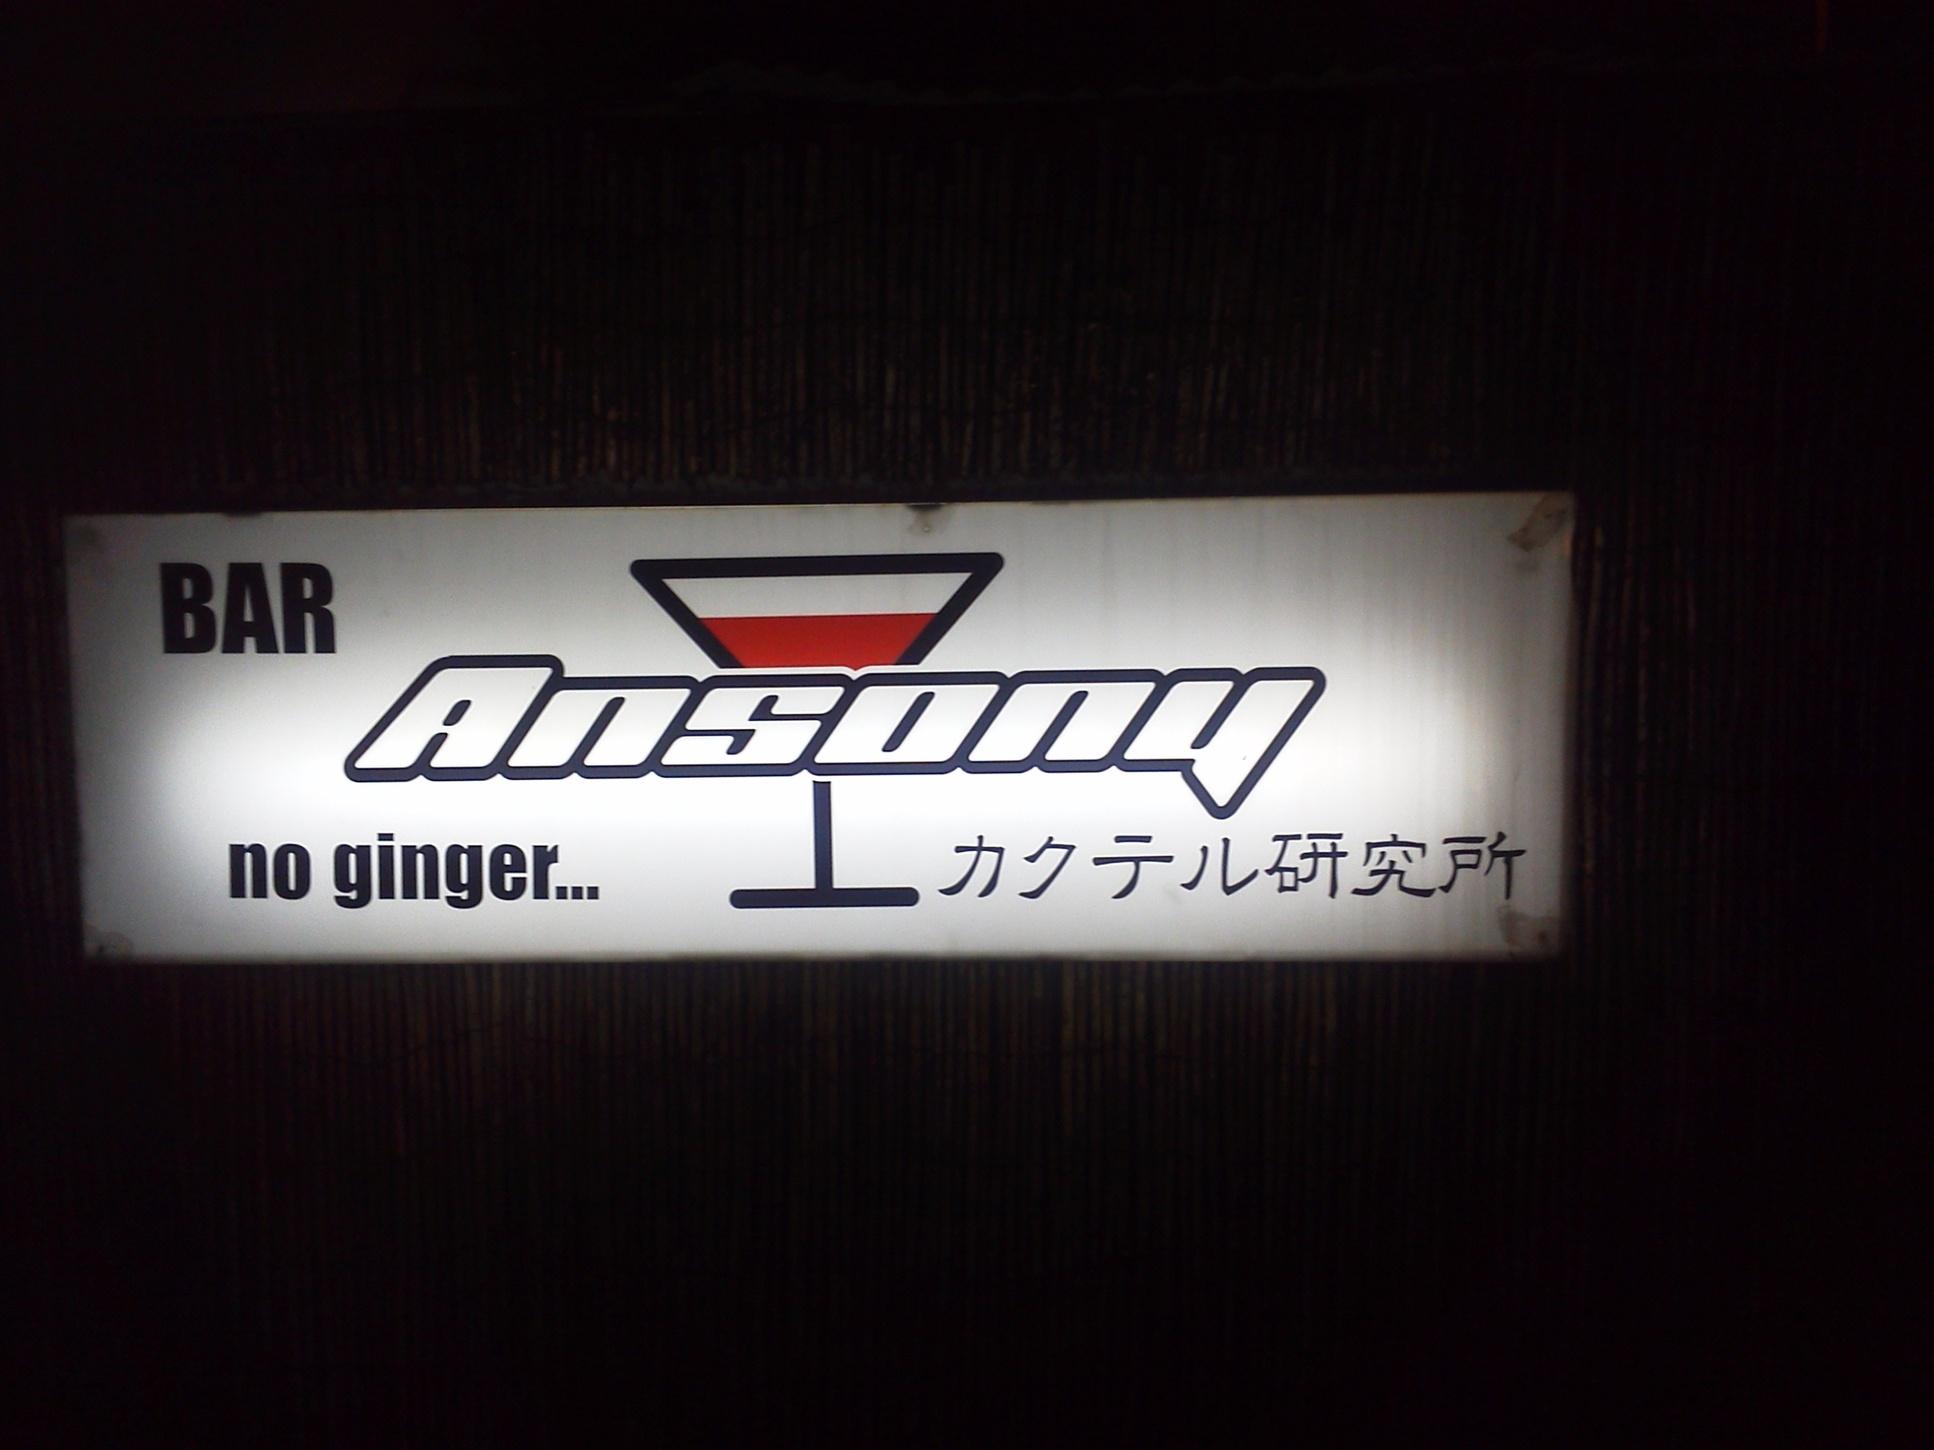 Bar Ansony